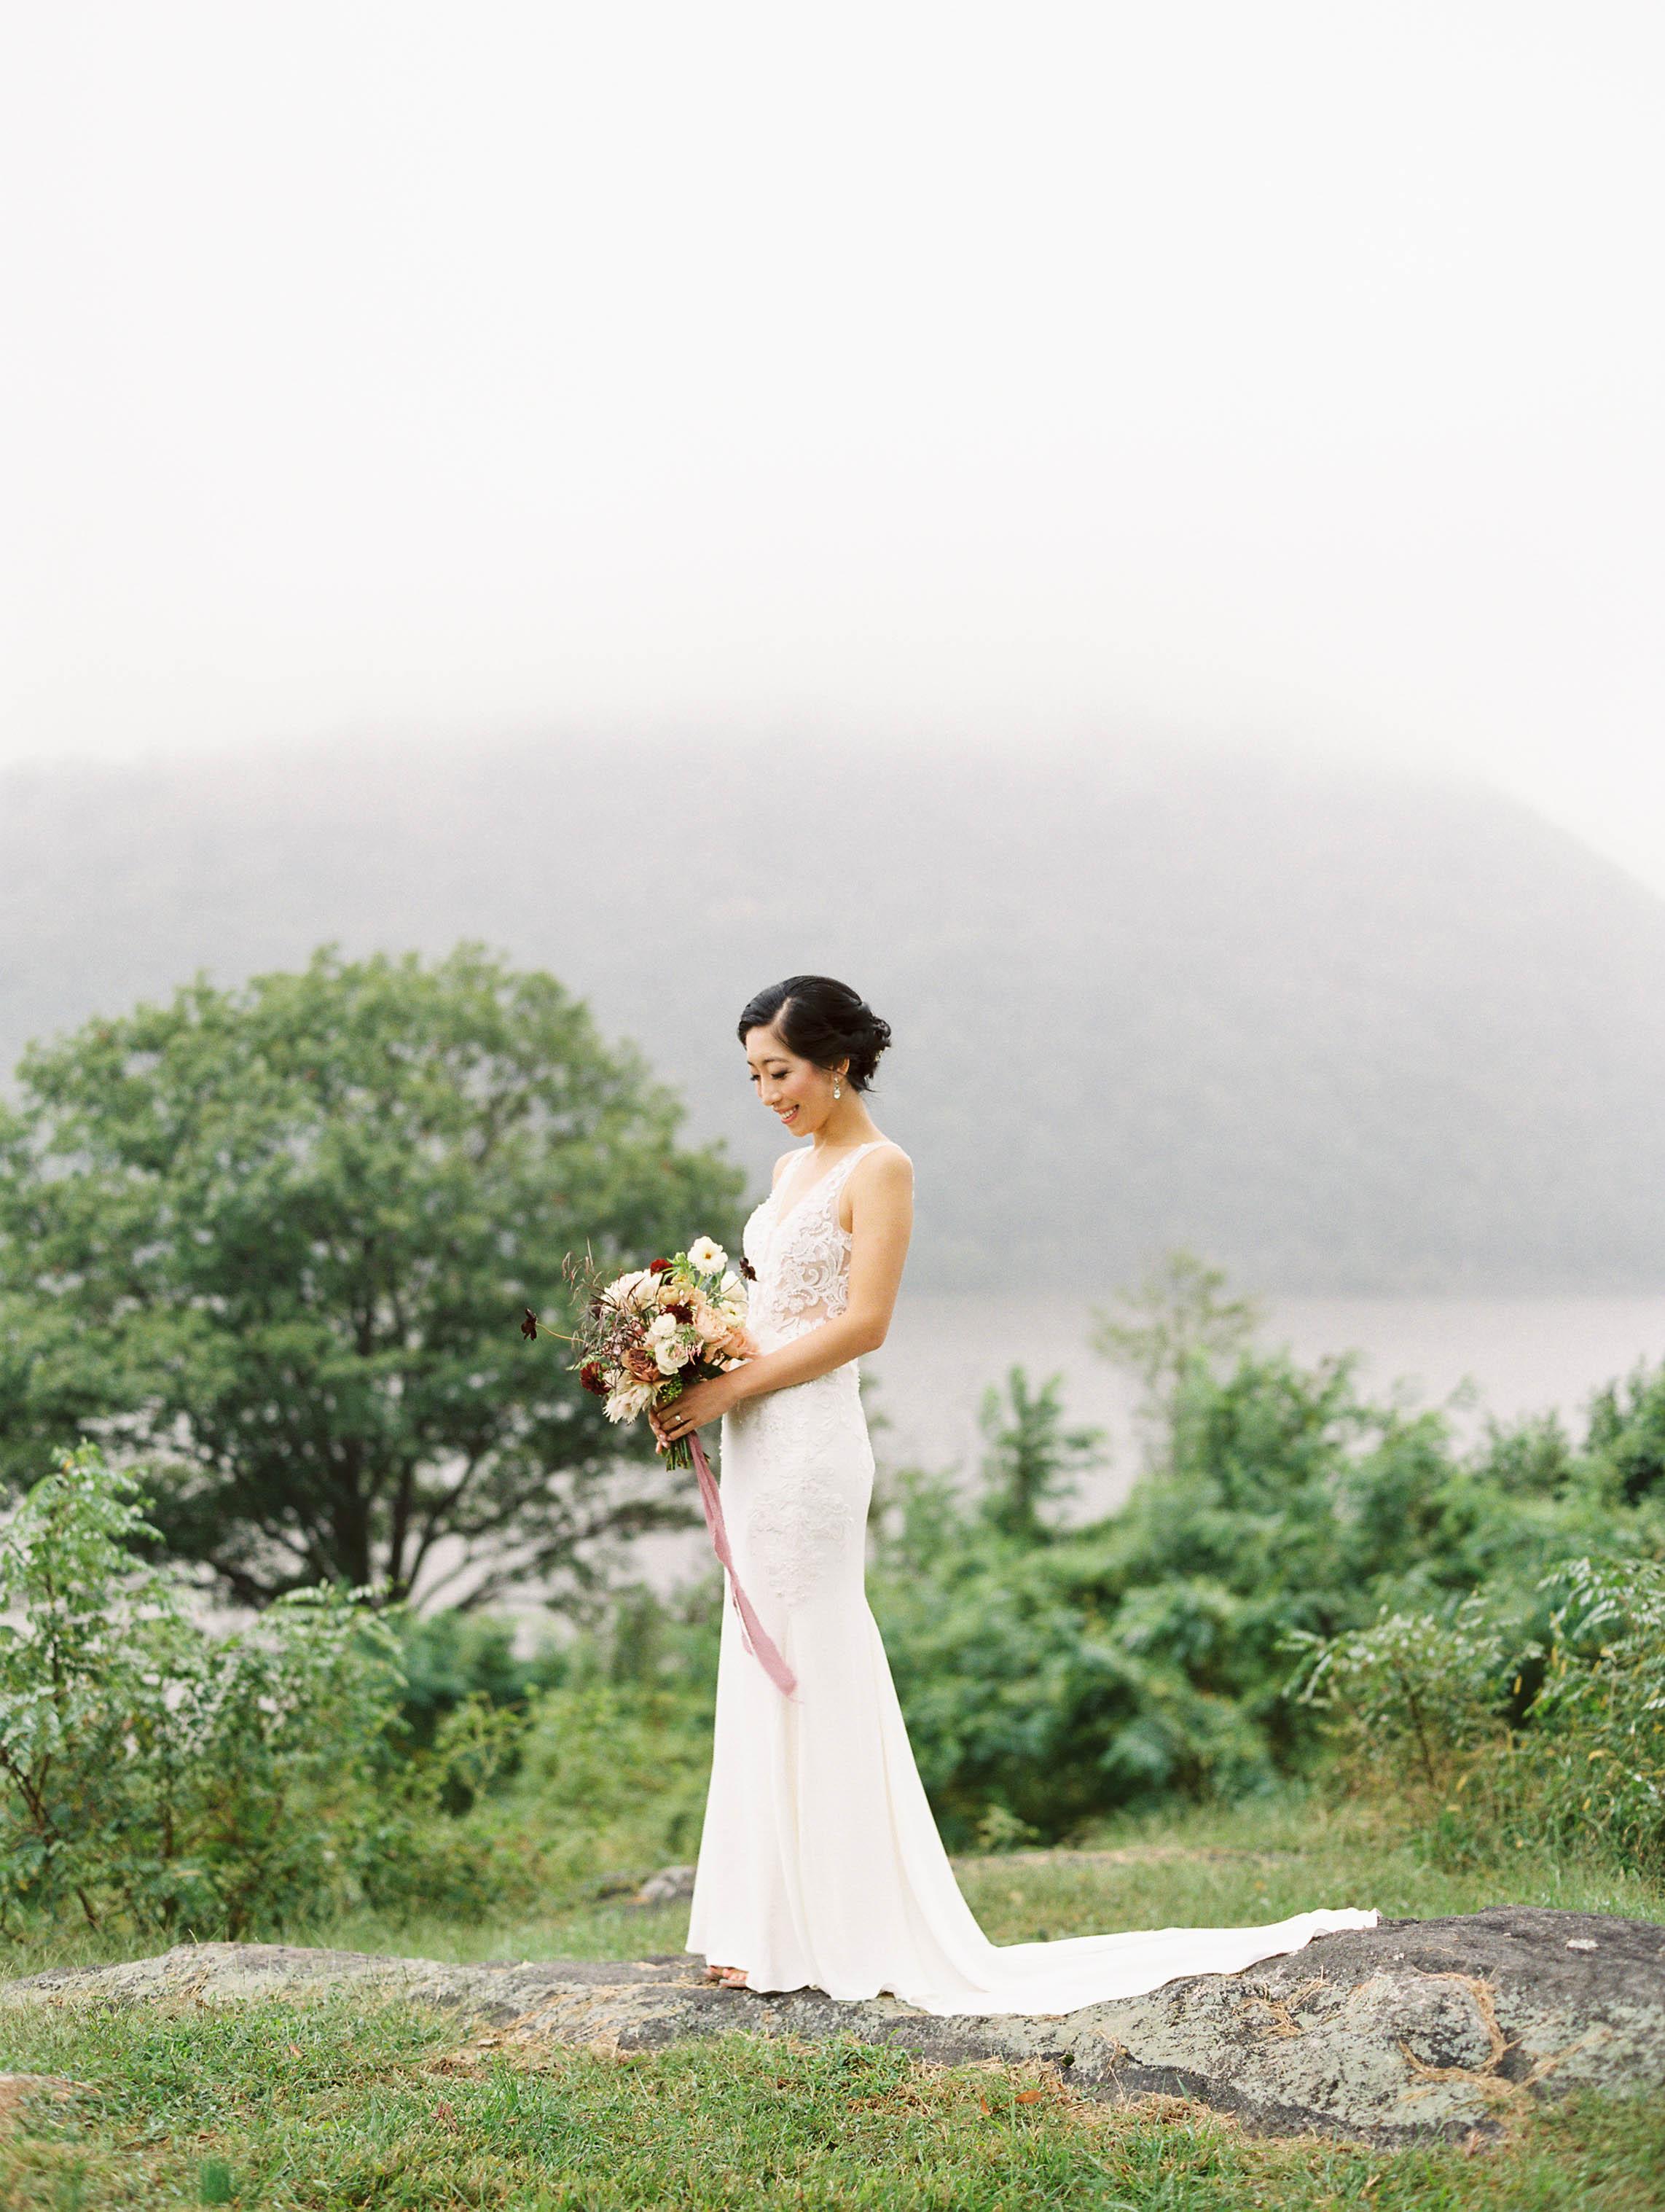 kelsandmichael_weddingphotography_ny-21.jpg